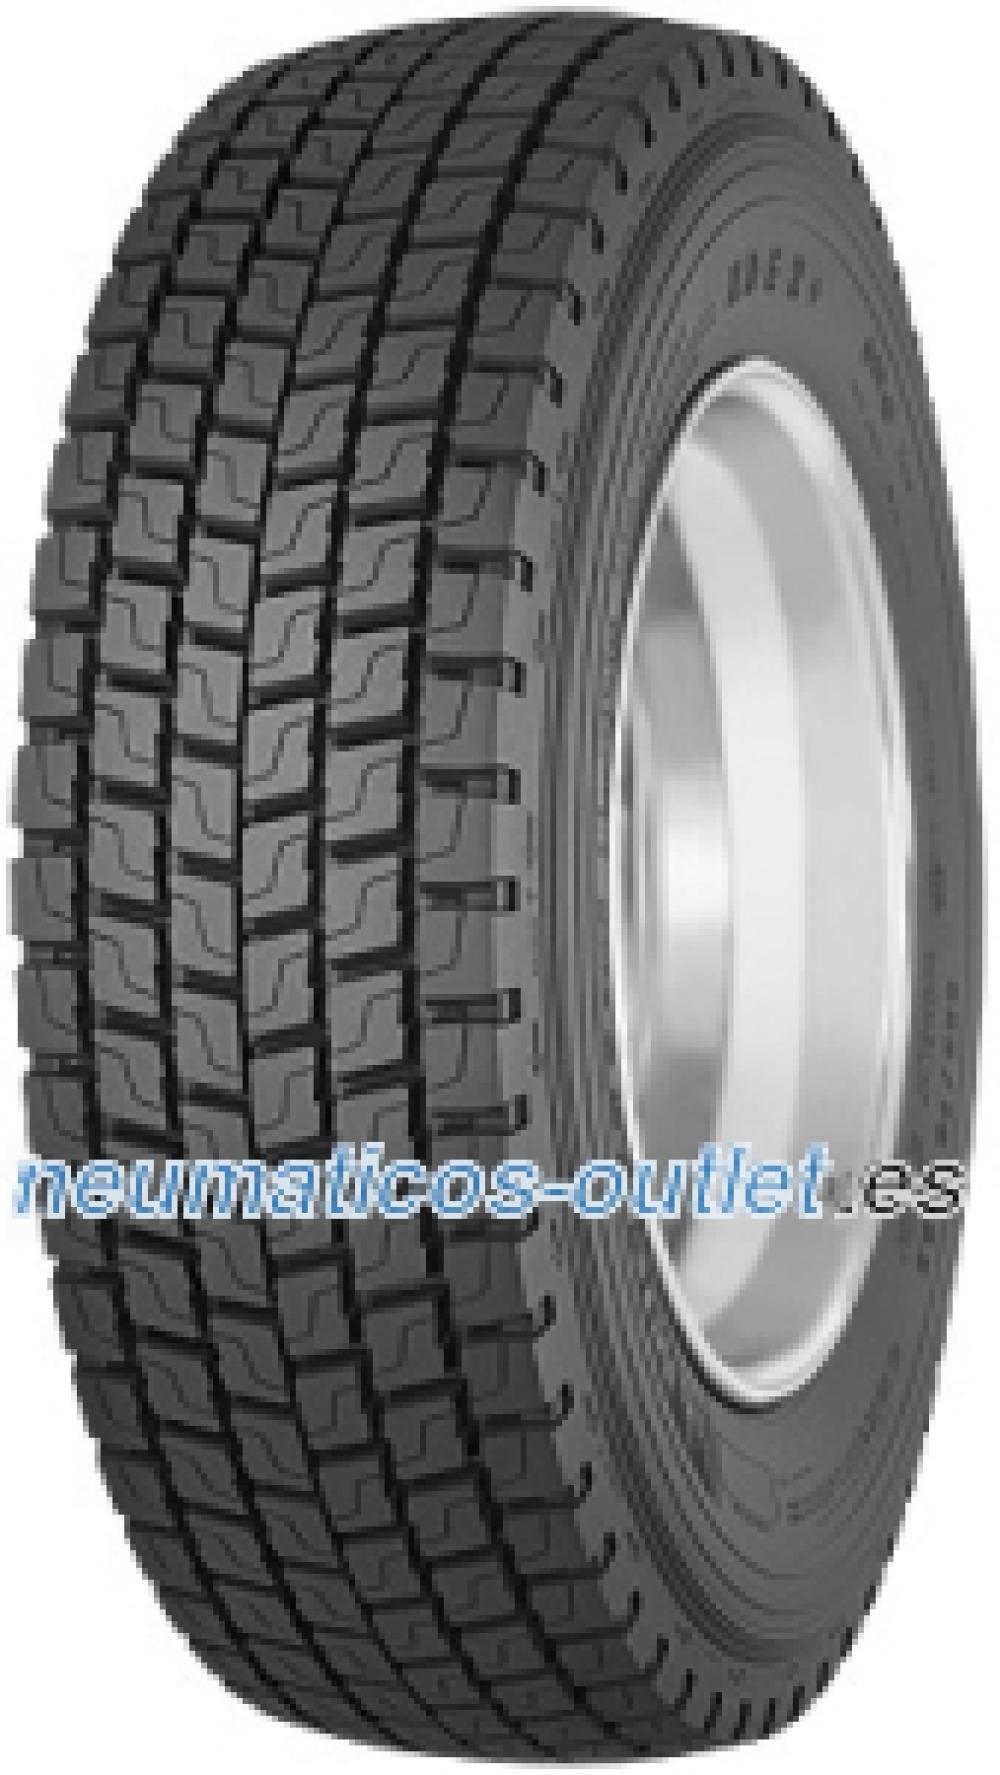 Michelin Remix XDE 2+ ( 285/70 R19.5 recauchutados )